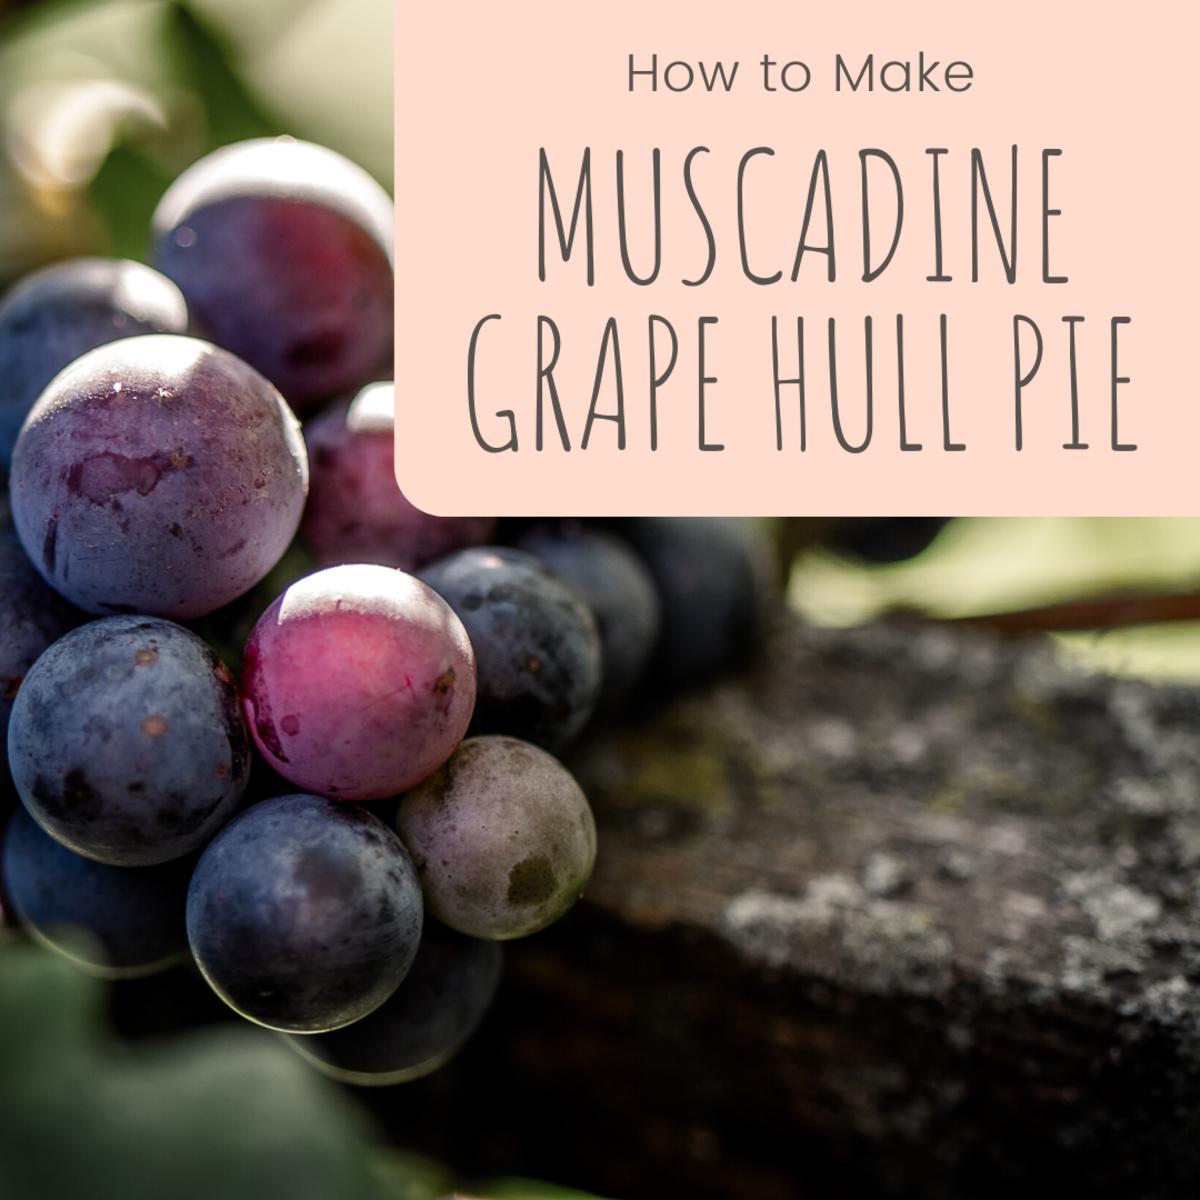 Muscadine Grape Hull Pie